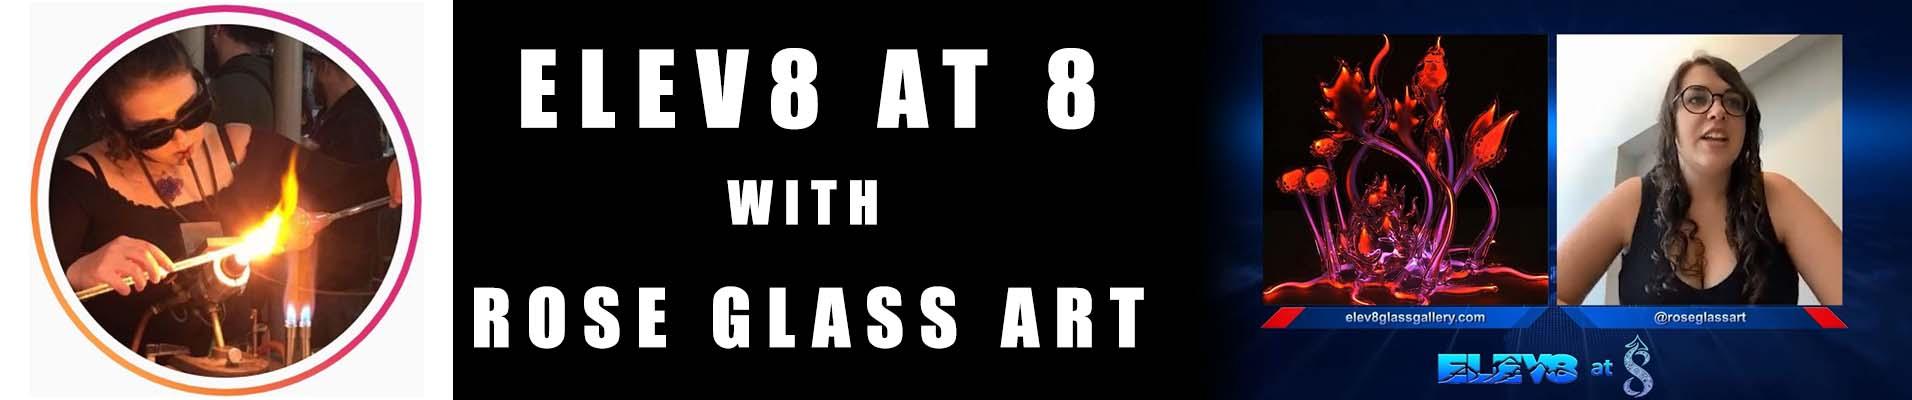 rose-glass-art-elev8-at-8-banner.jpg